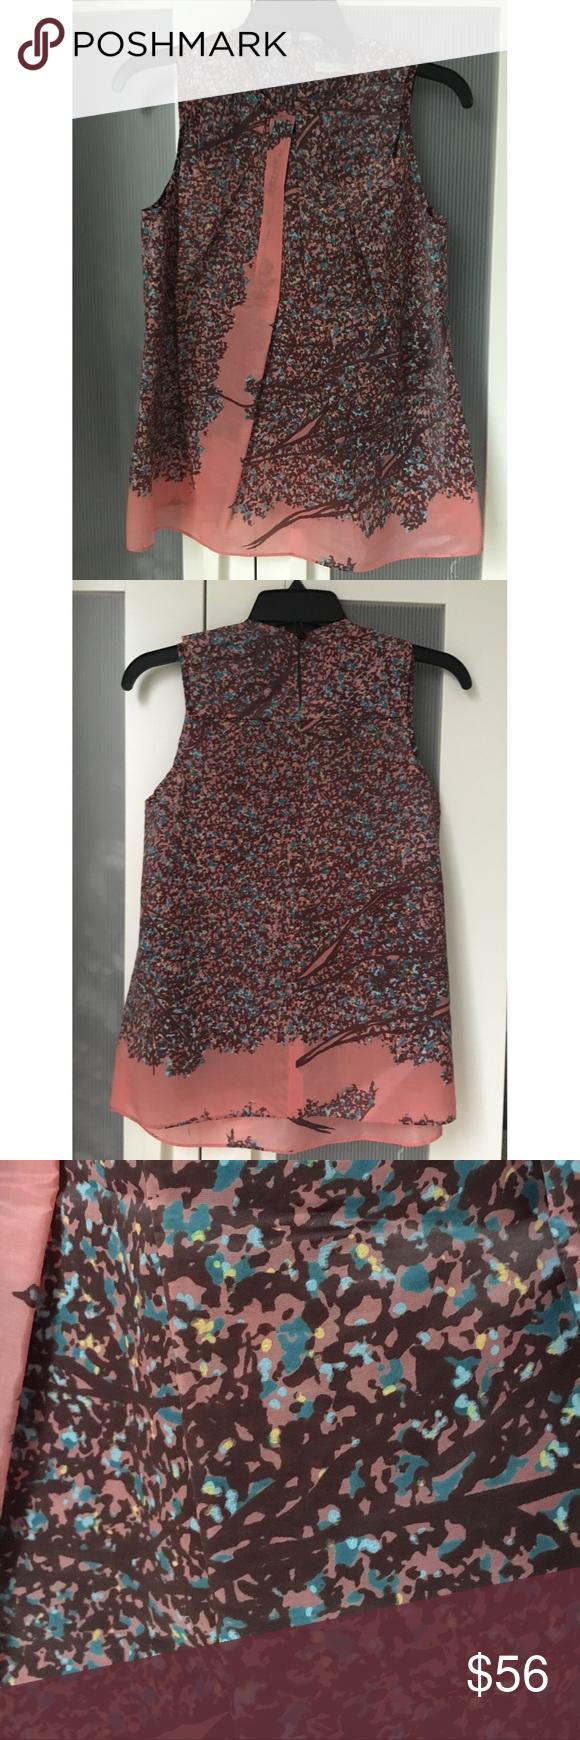 Gorgeous Balenciaga Silk Top - Like New! Pink and multicolor Balenciaga sleeveless printed silk top with crew neck and button closure at back. Perfect condition- like new! Balenciaga Tops